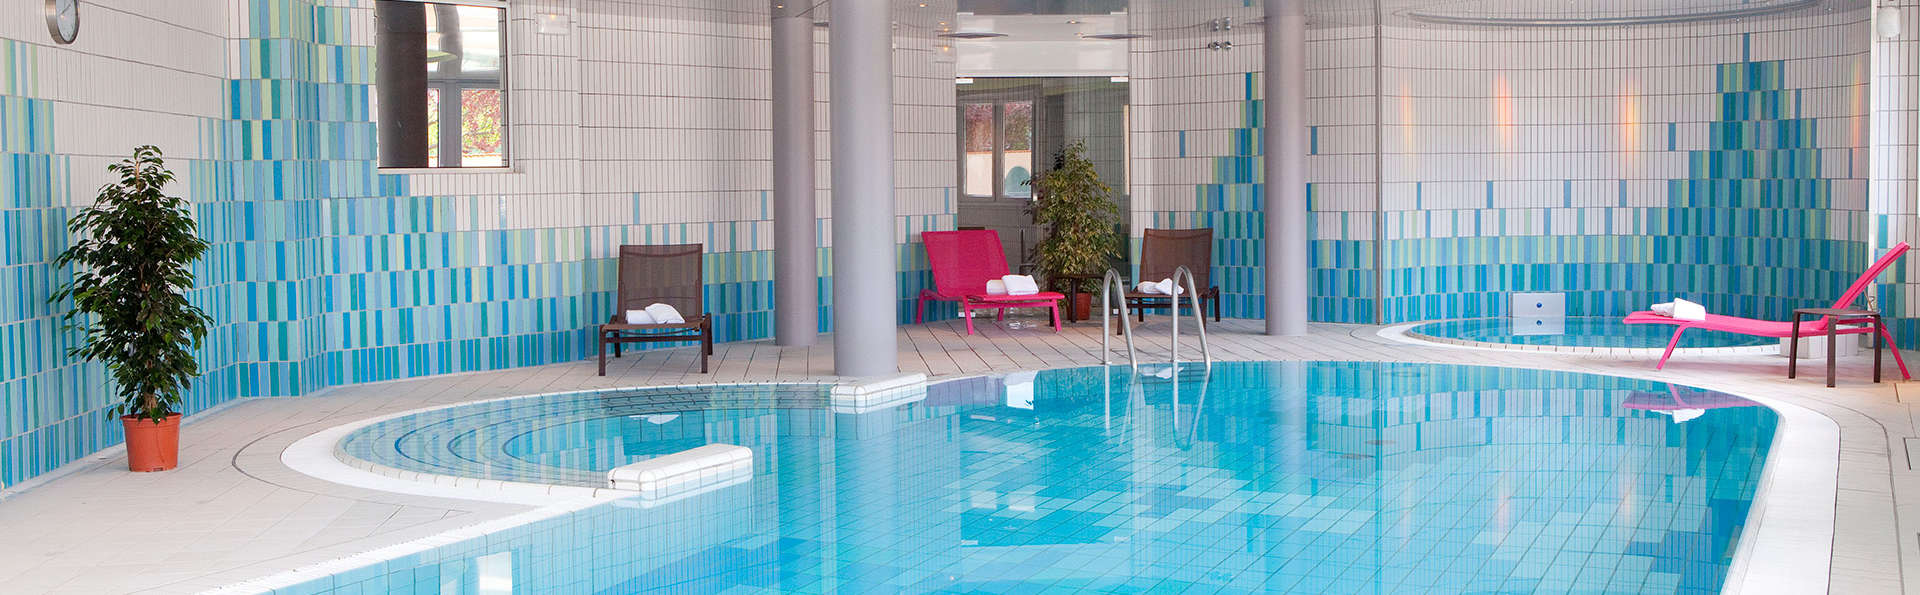 Hôtel l'Europe - EDIT_inpool.jpg